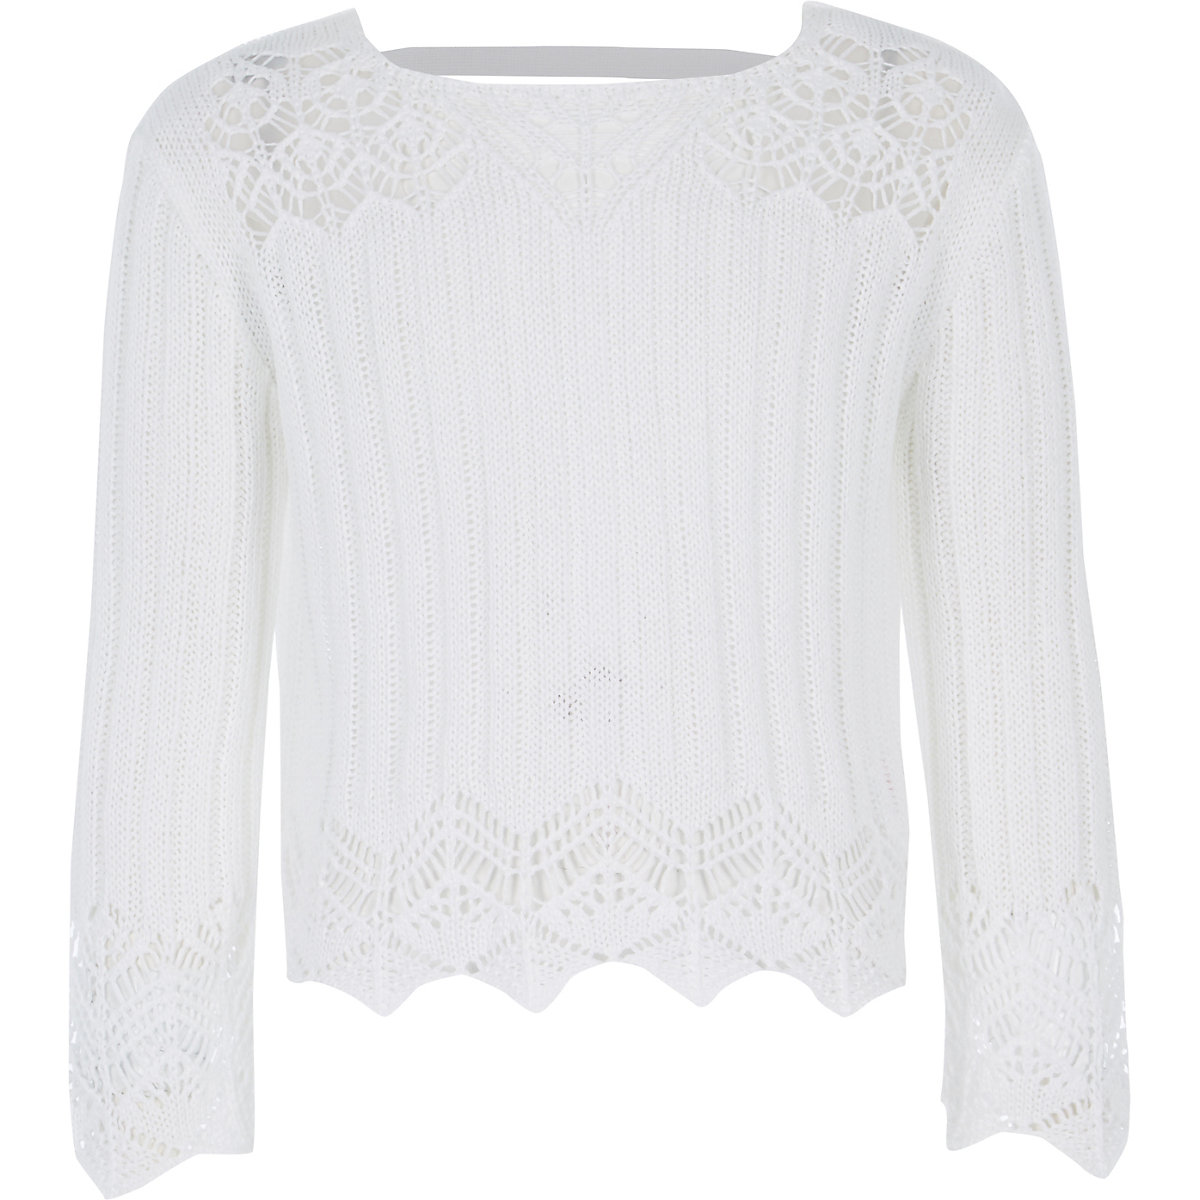 Girls white crotchet wide sleeve top